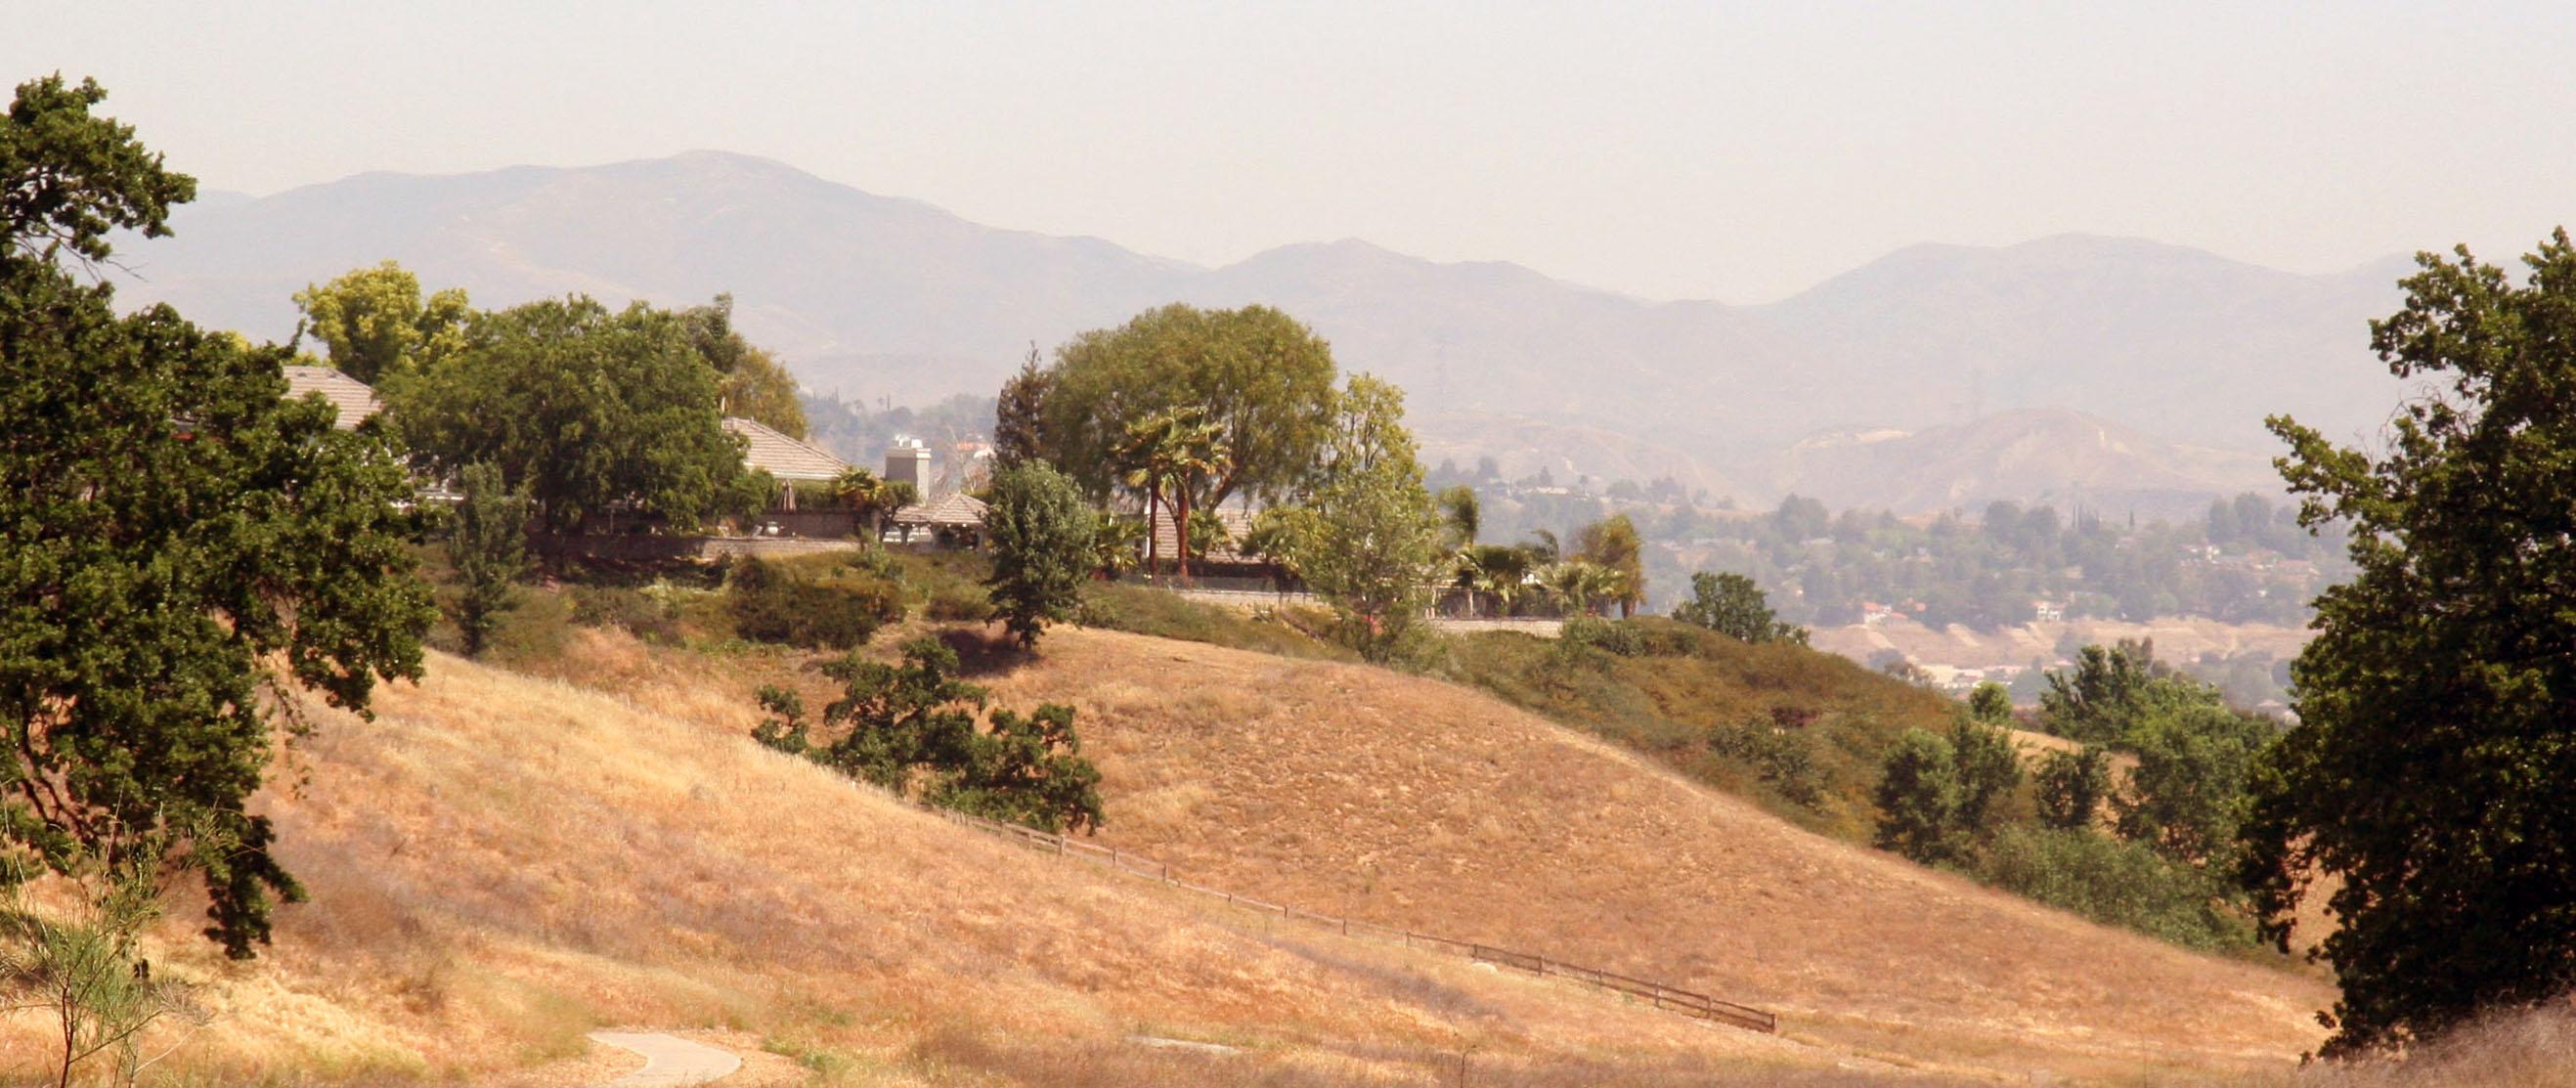 Valencia Summit homes and paseo hillsides